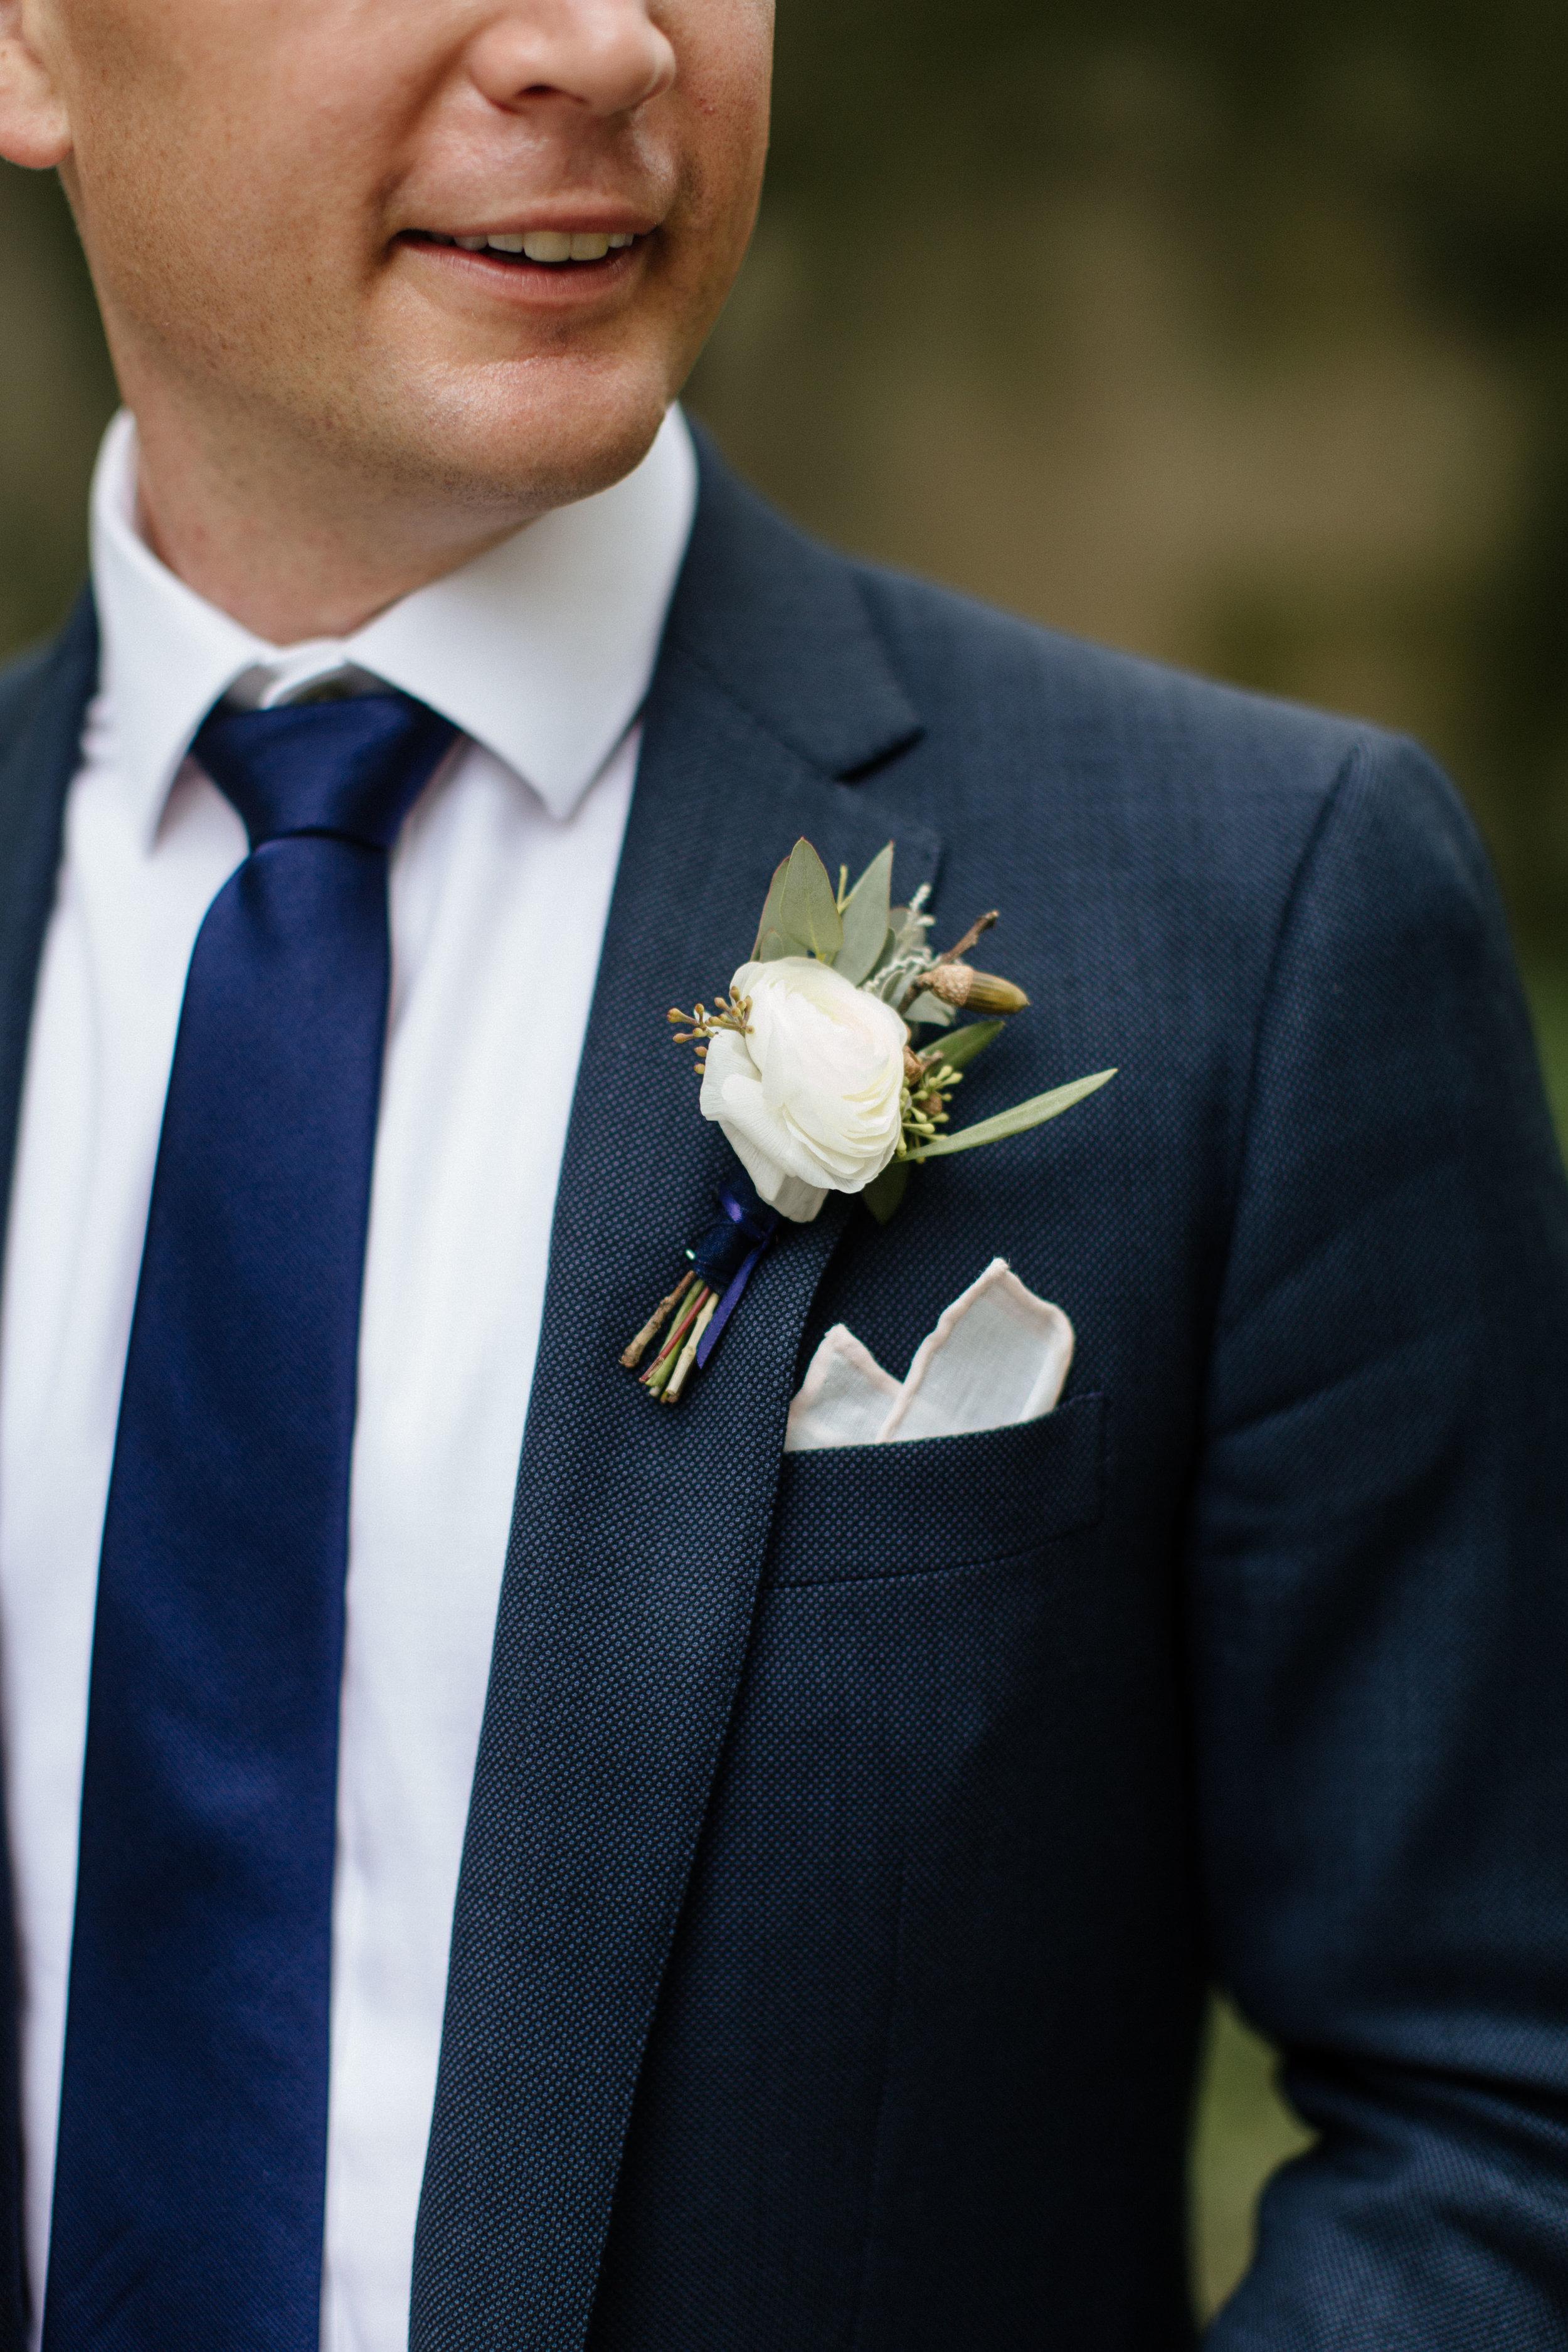 02_jukes_wedding-290.JPG